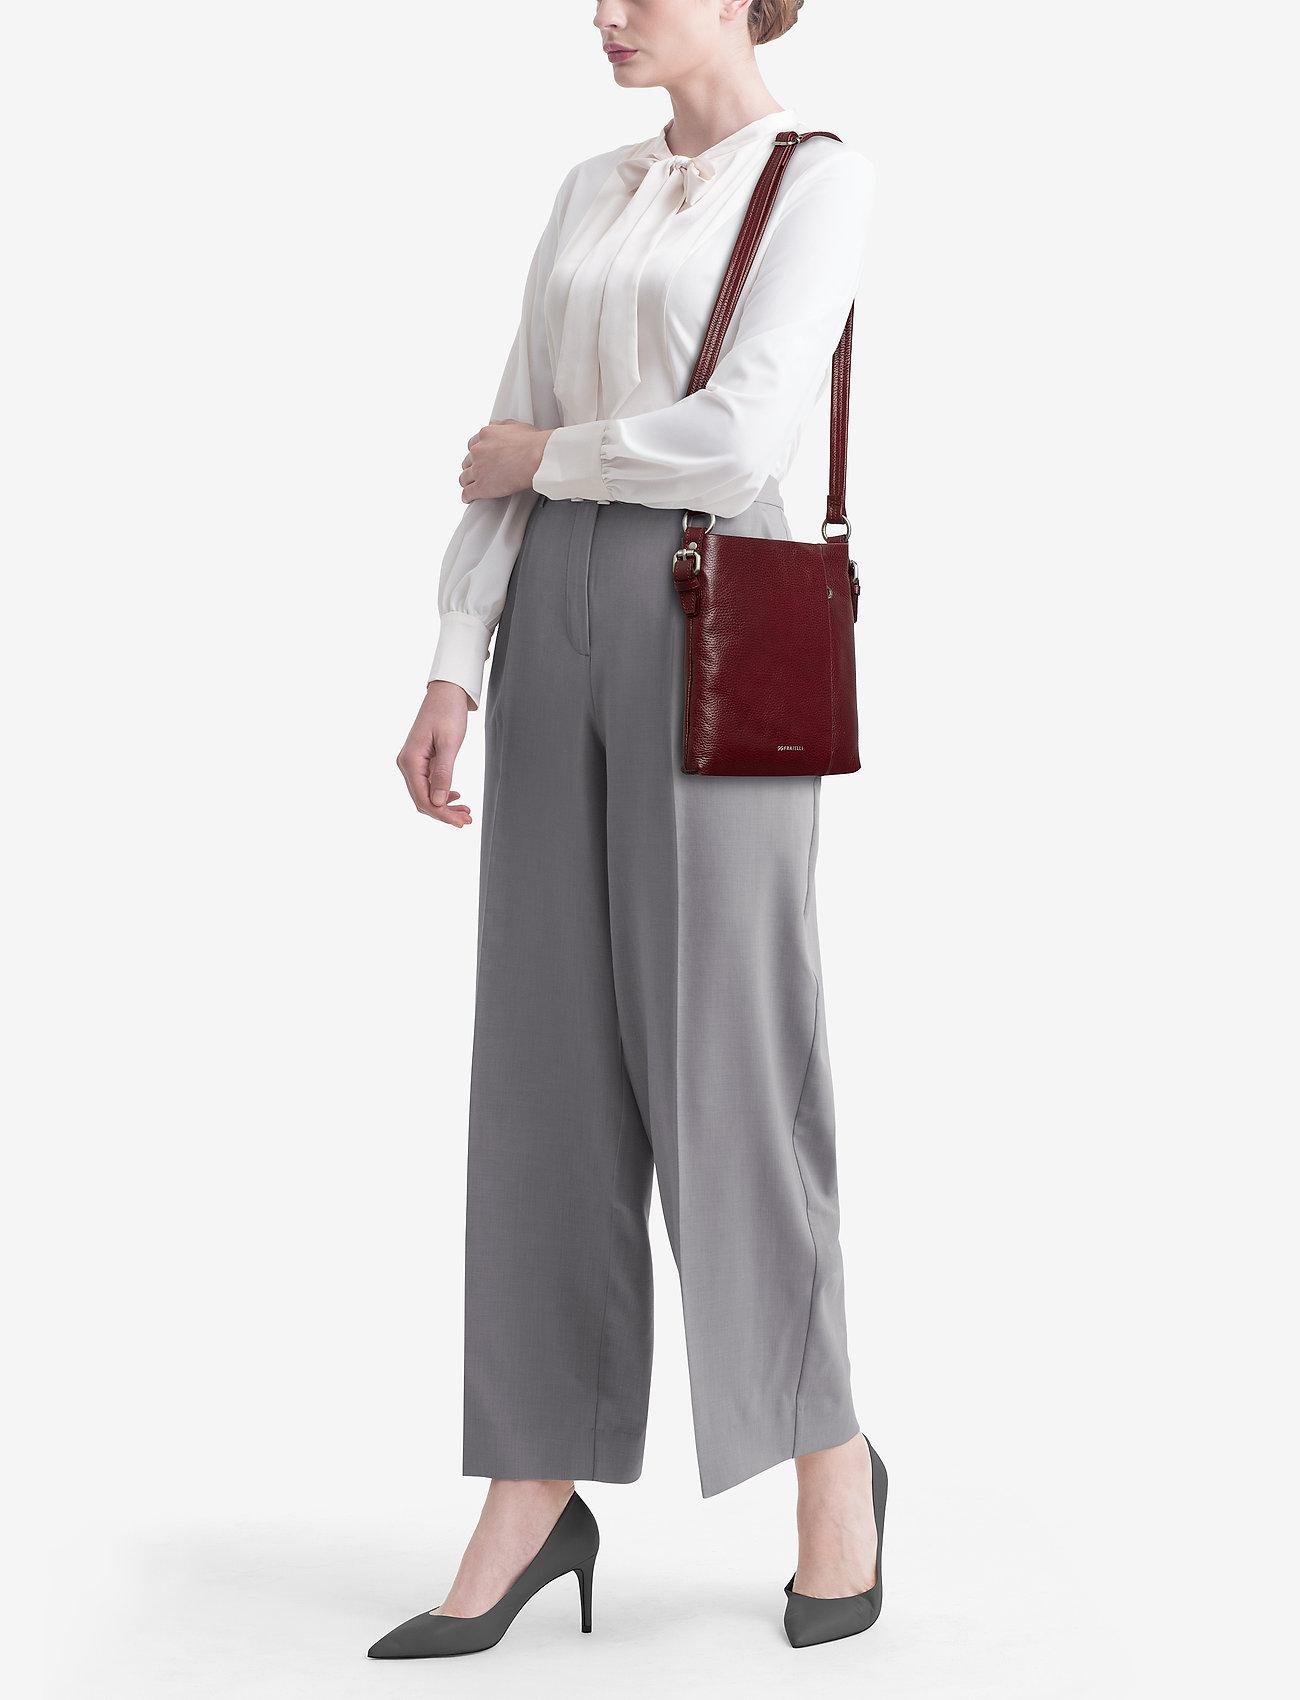 GiGi Fratelli Romance shoulderbag / crossbody bag - RUBINO